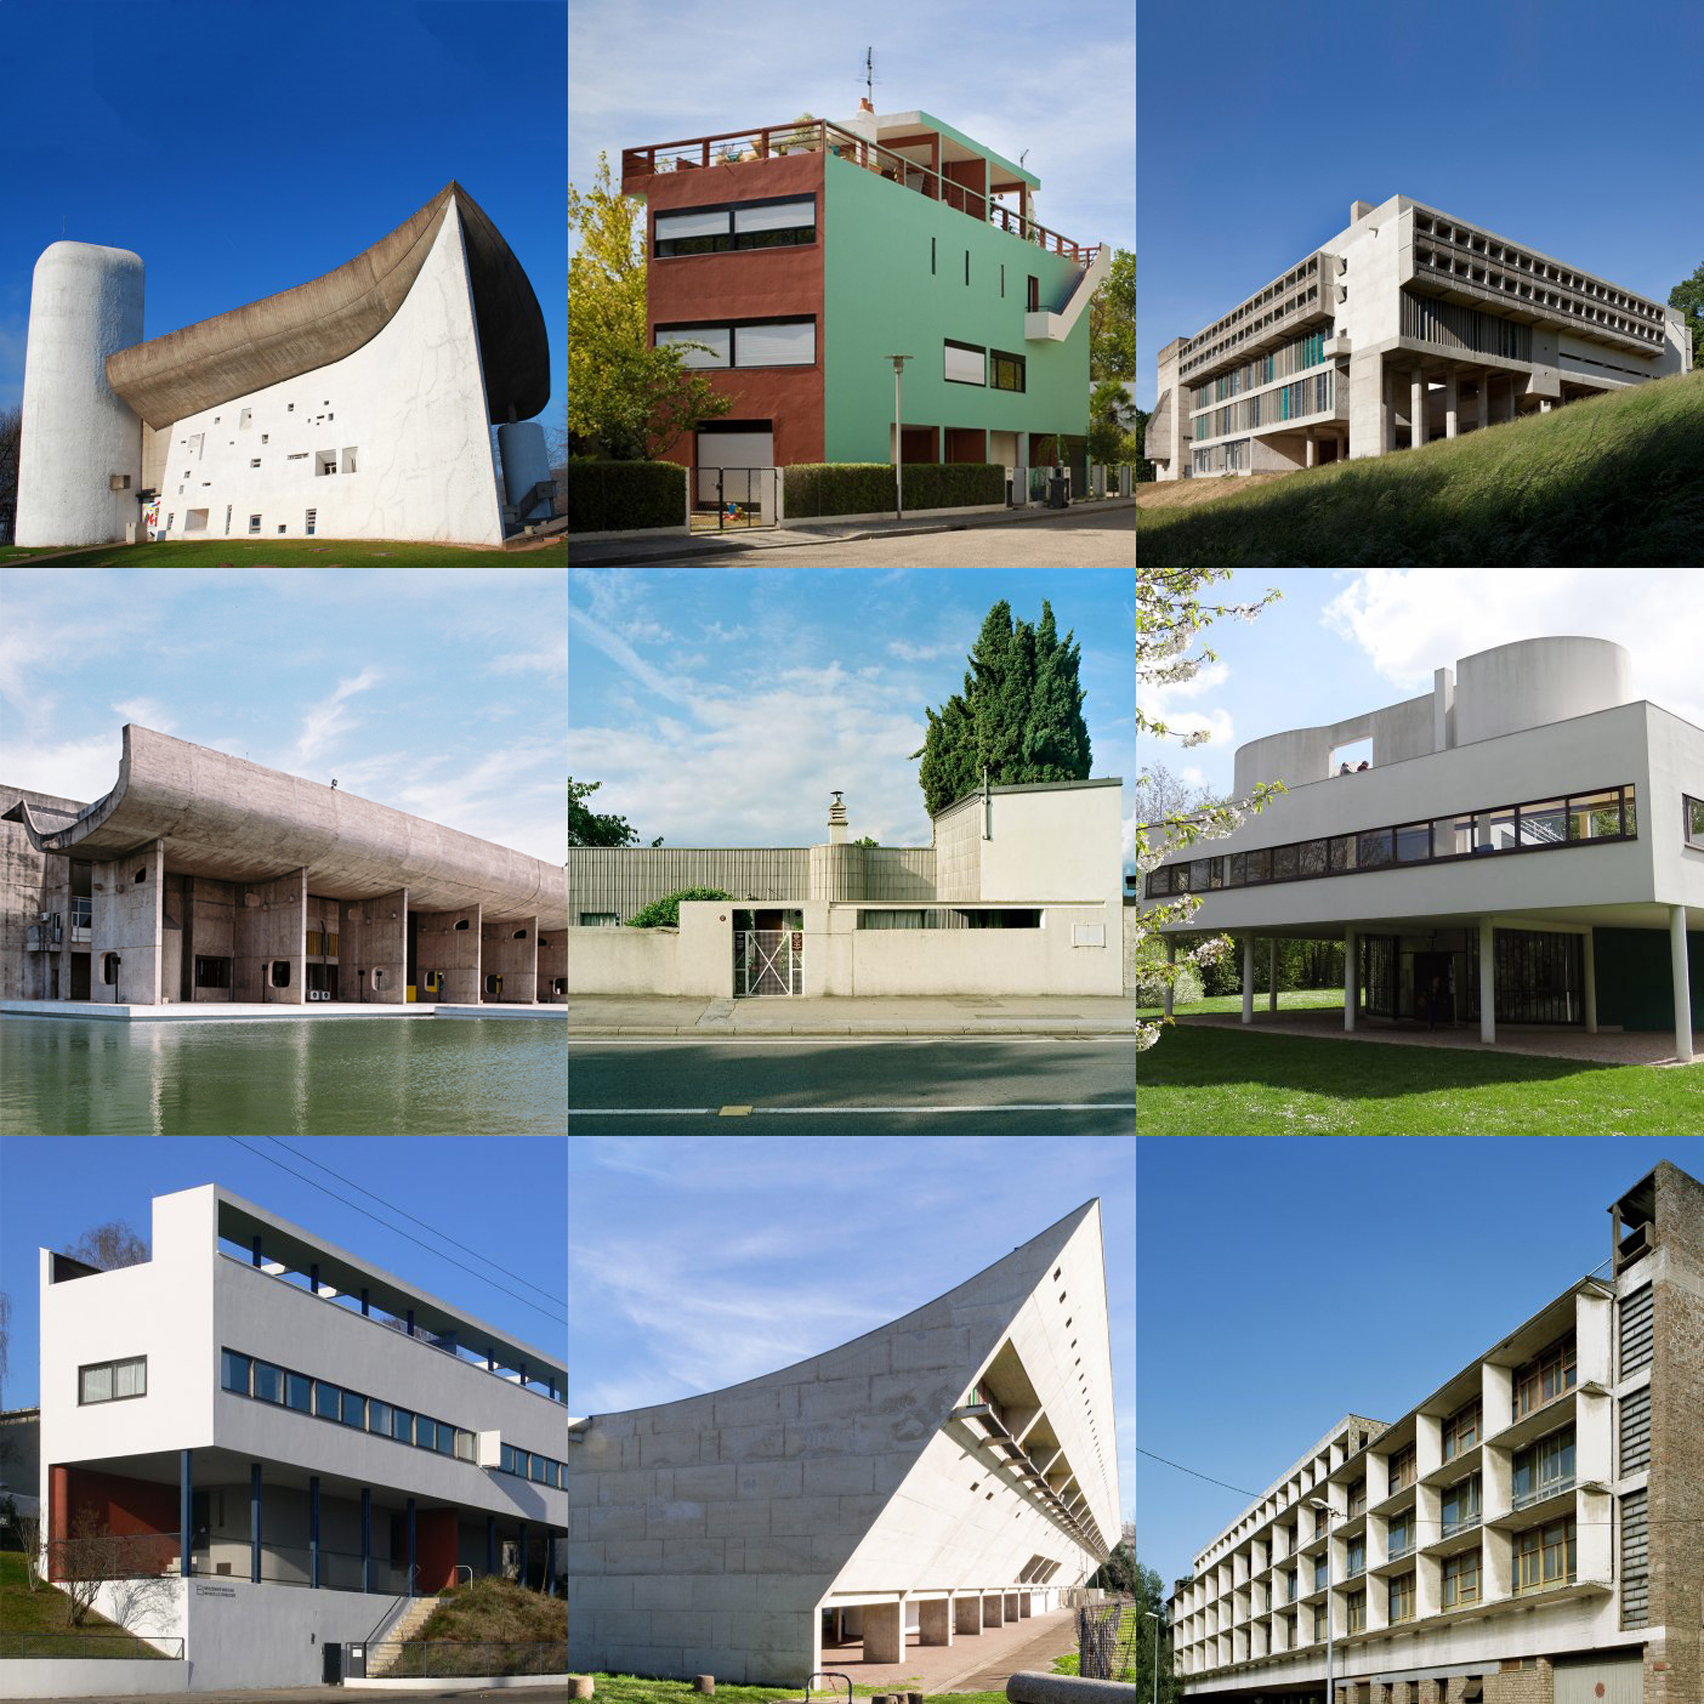 Le corbusier furniture celebrate le corbusier top 5 most famous works - Discover Le Corbusier S Most Important Architecture On Dezeen S New Pinterest Board